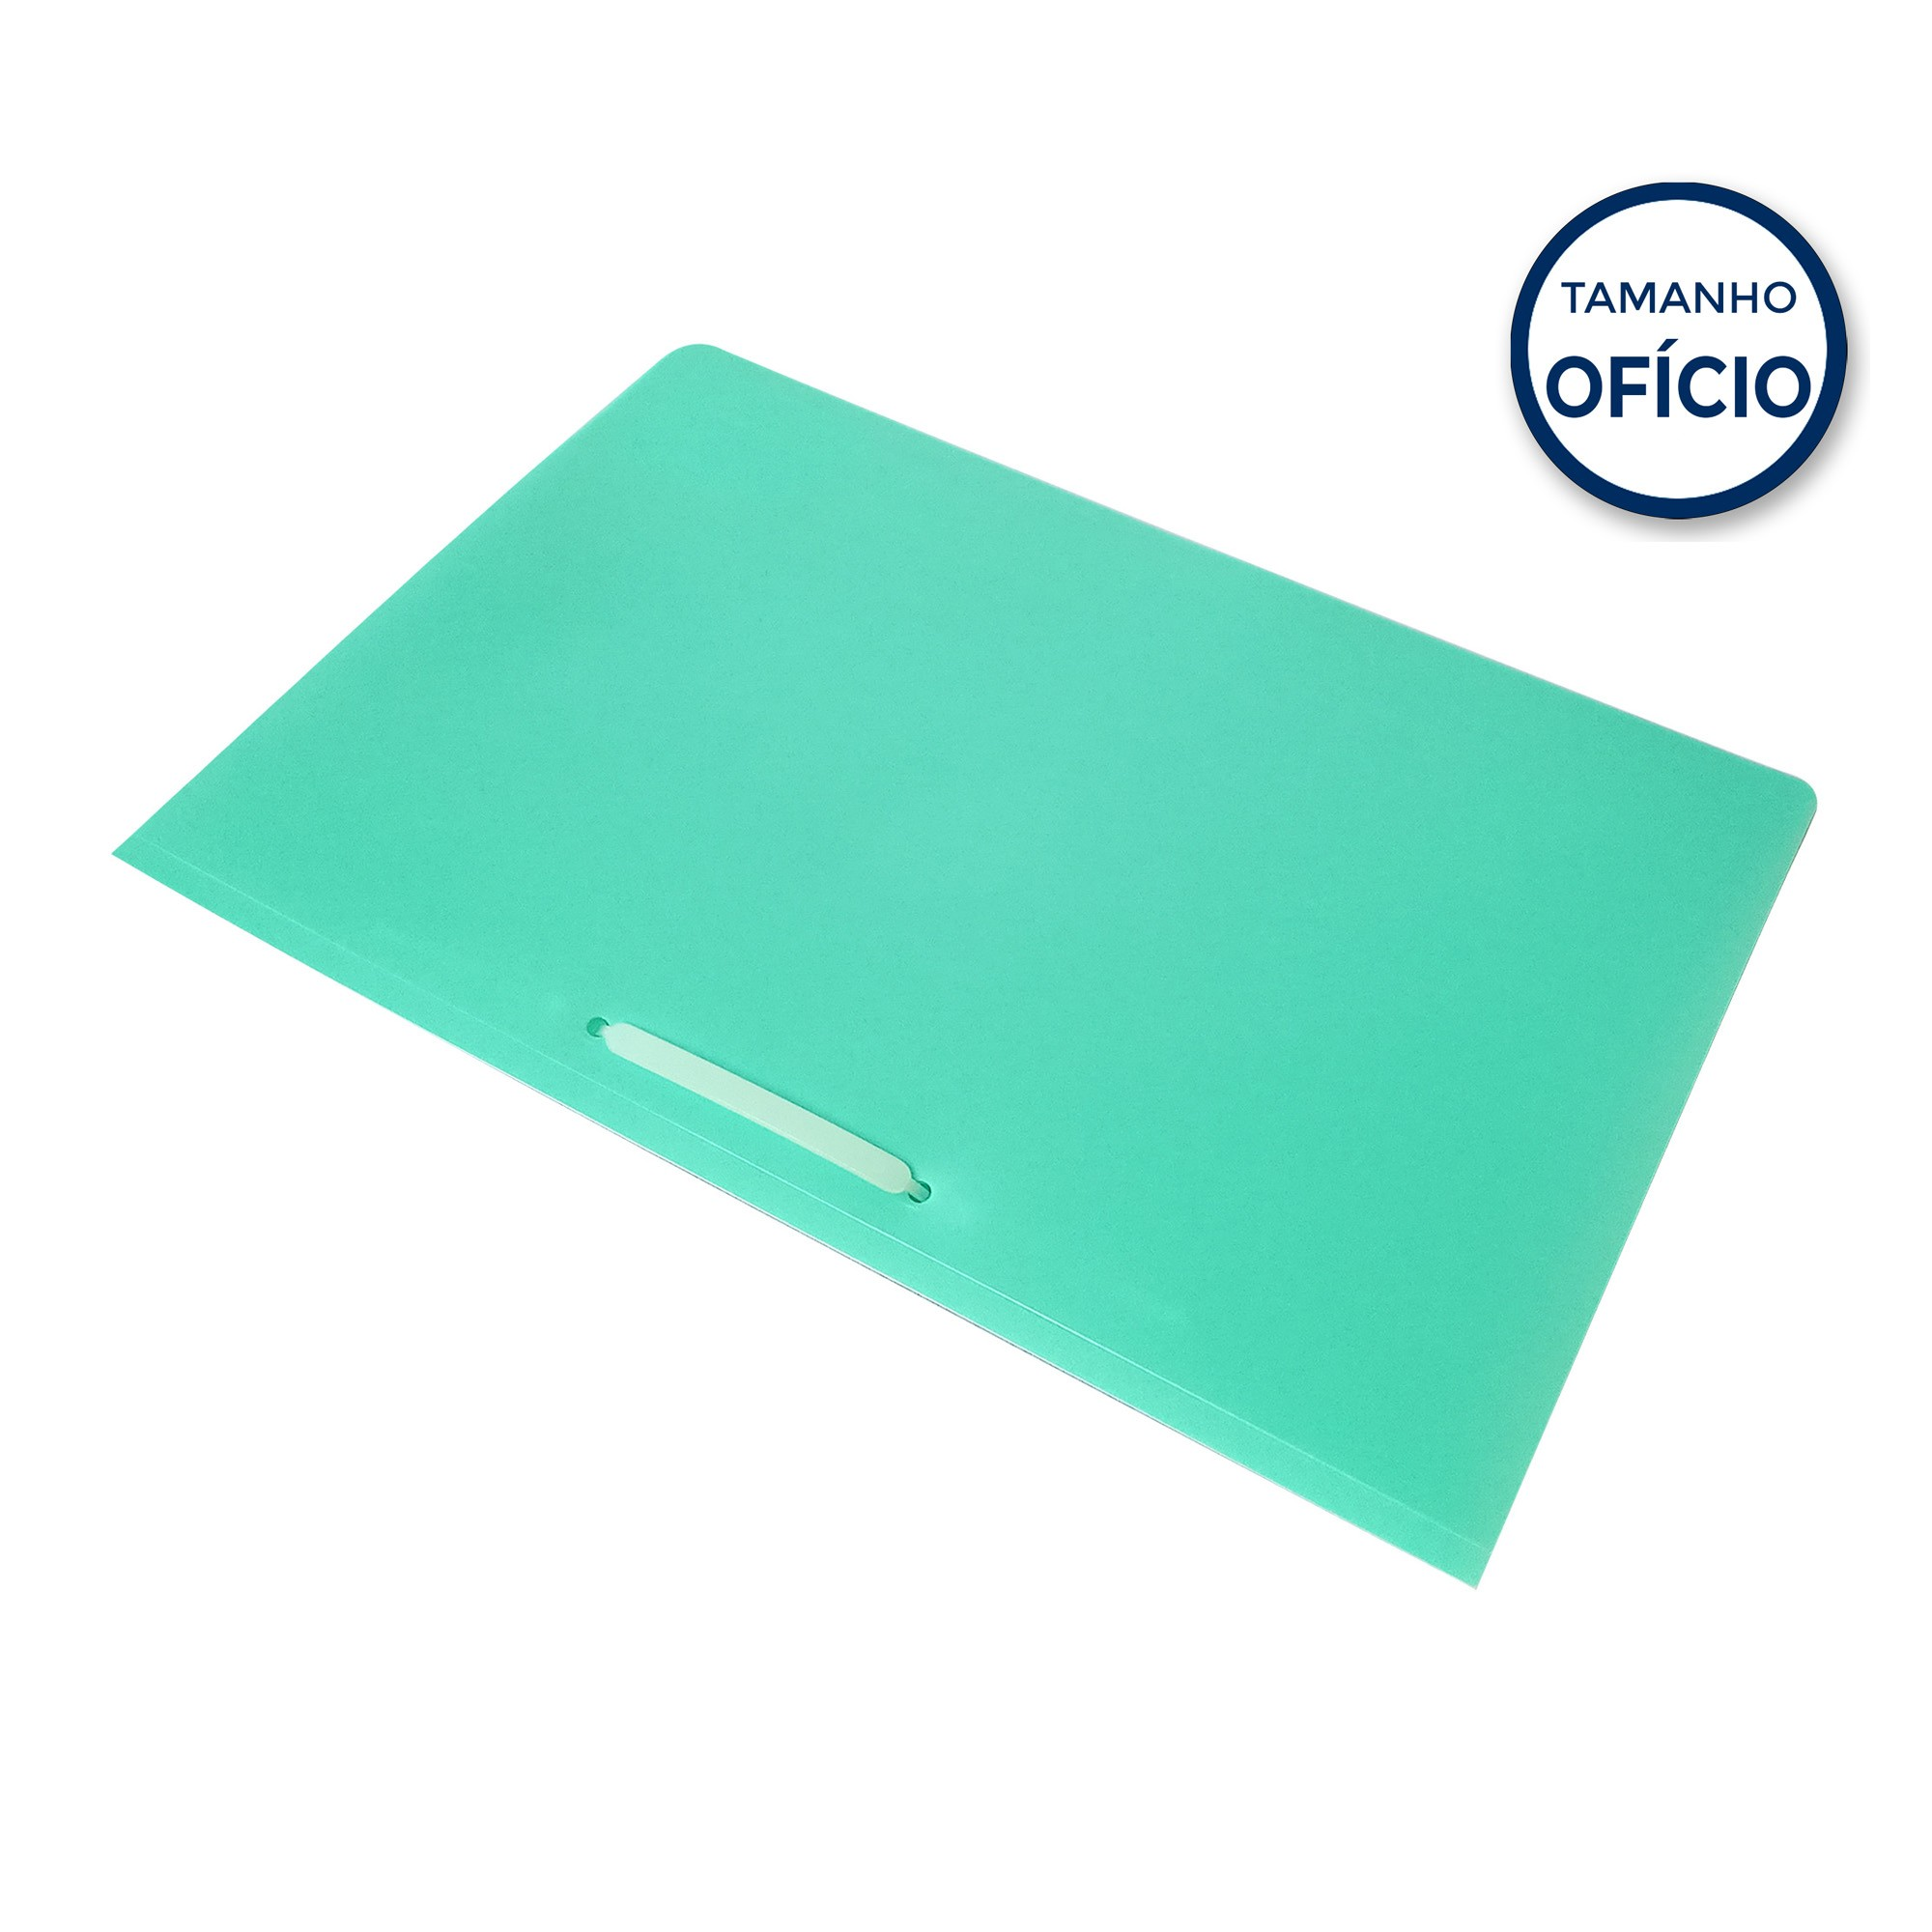 Pasta Oficio com Grampo Plastico Cor Verde Tam 240mm x 340mm- Acp